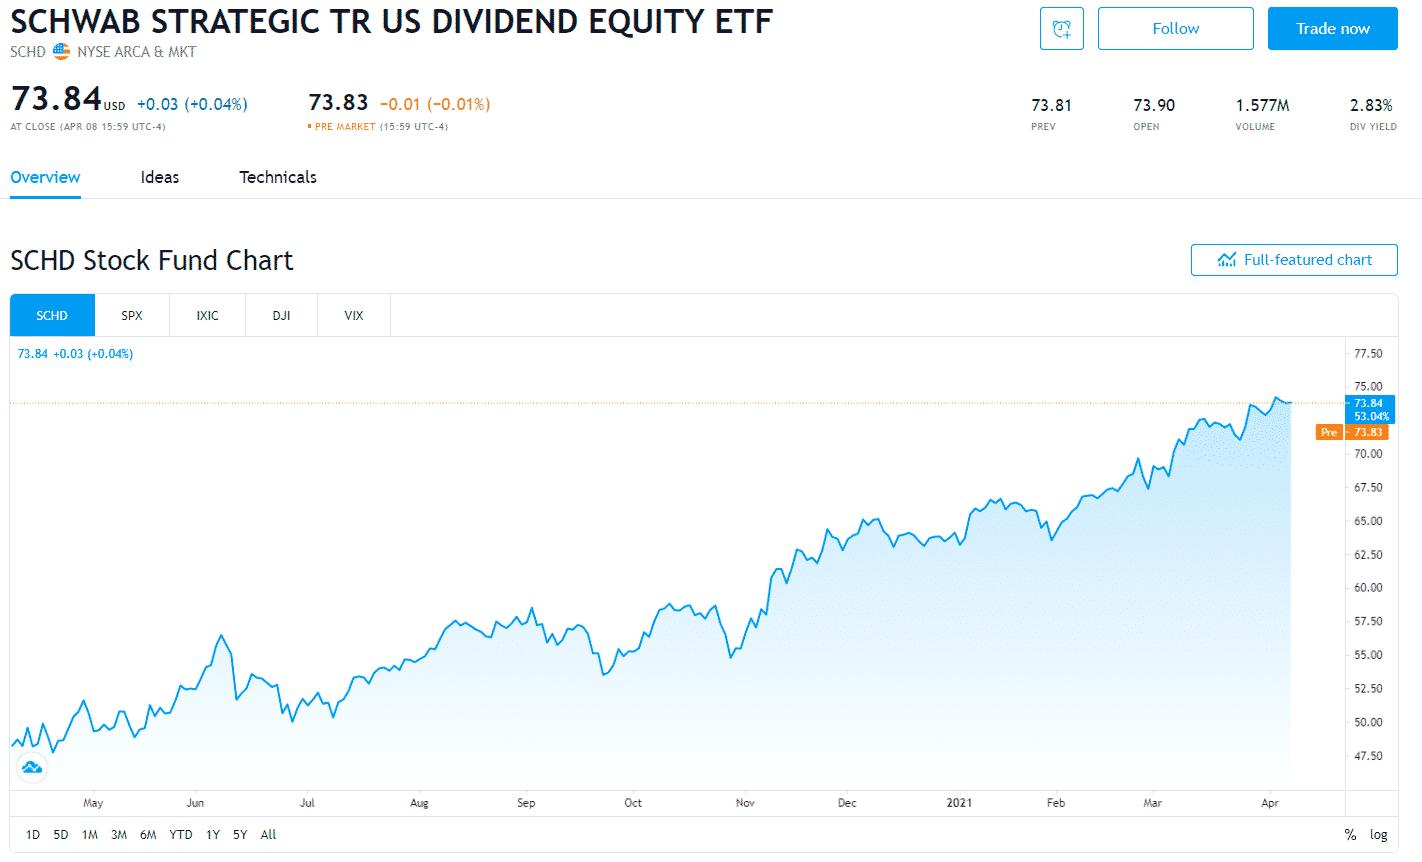 Schwab U.S. Dividend Equity ETF (SCHD)